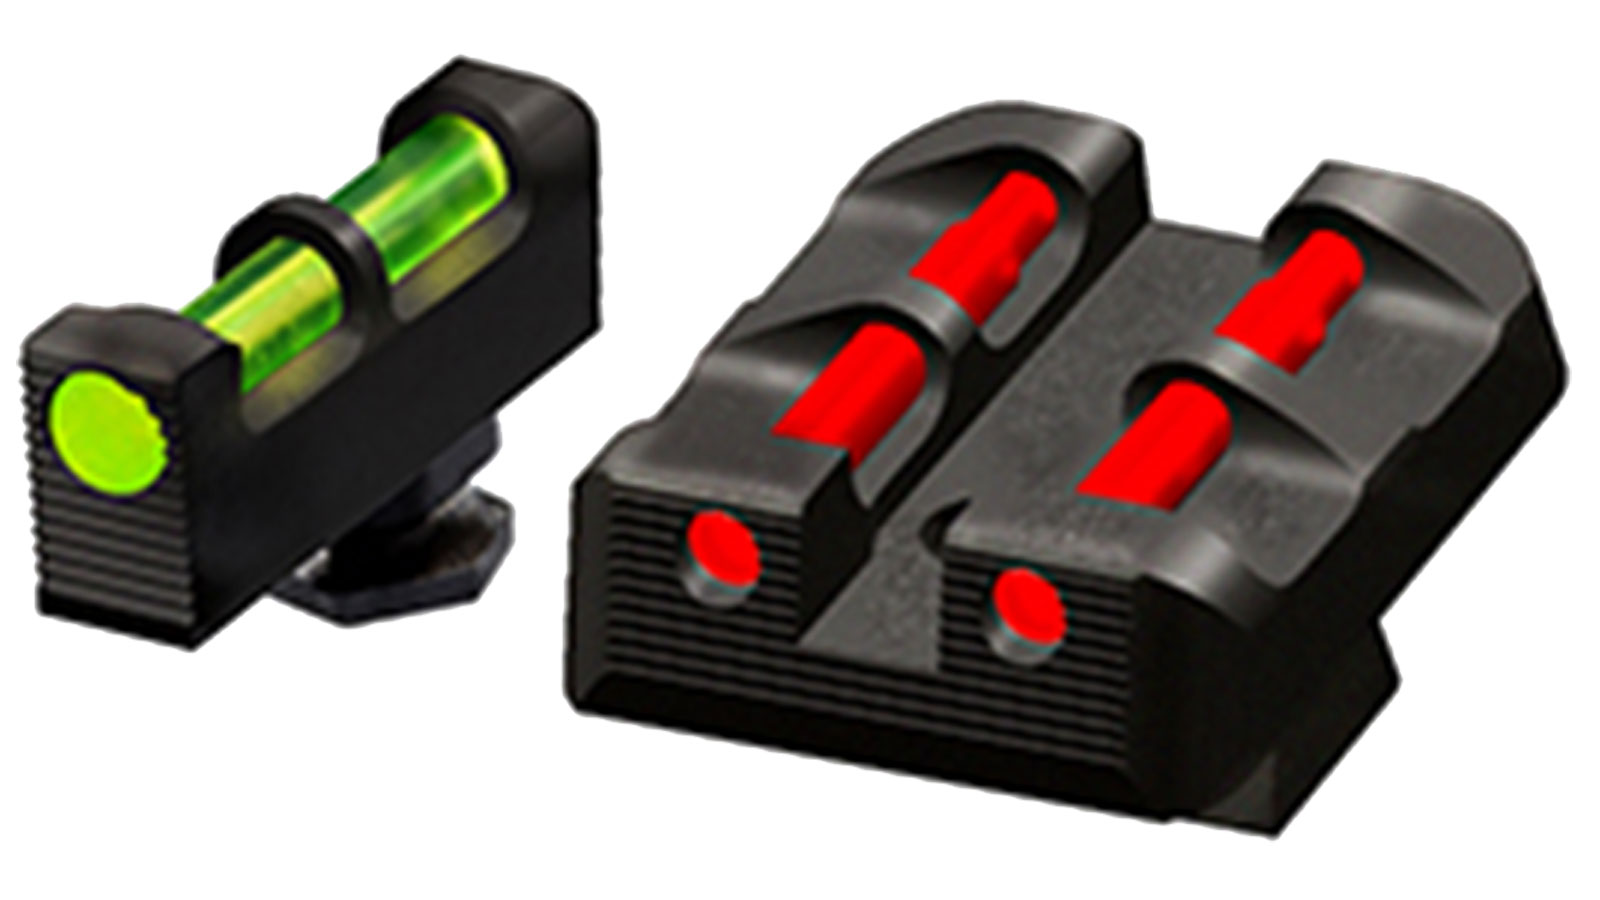 Hiviz  Glock Target Sights All Glock Green|Red|White Front Green|Red|Black Rear Black